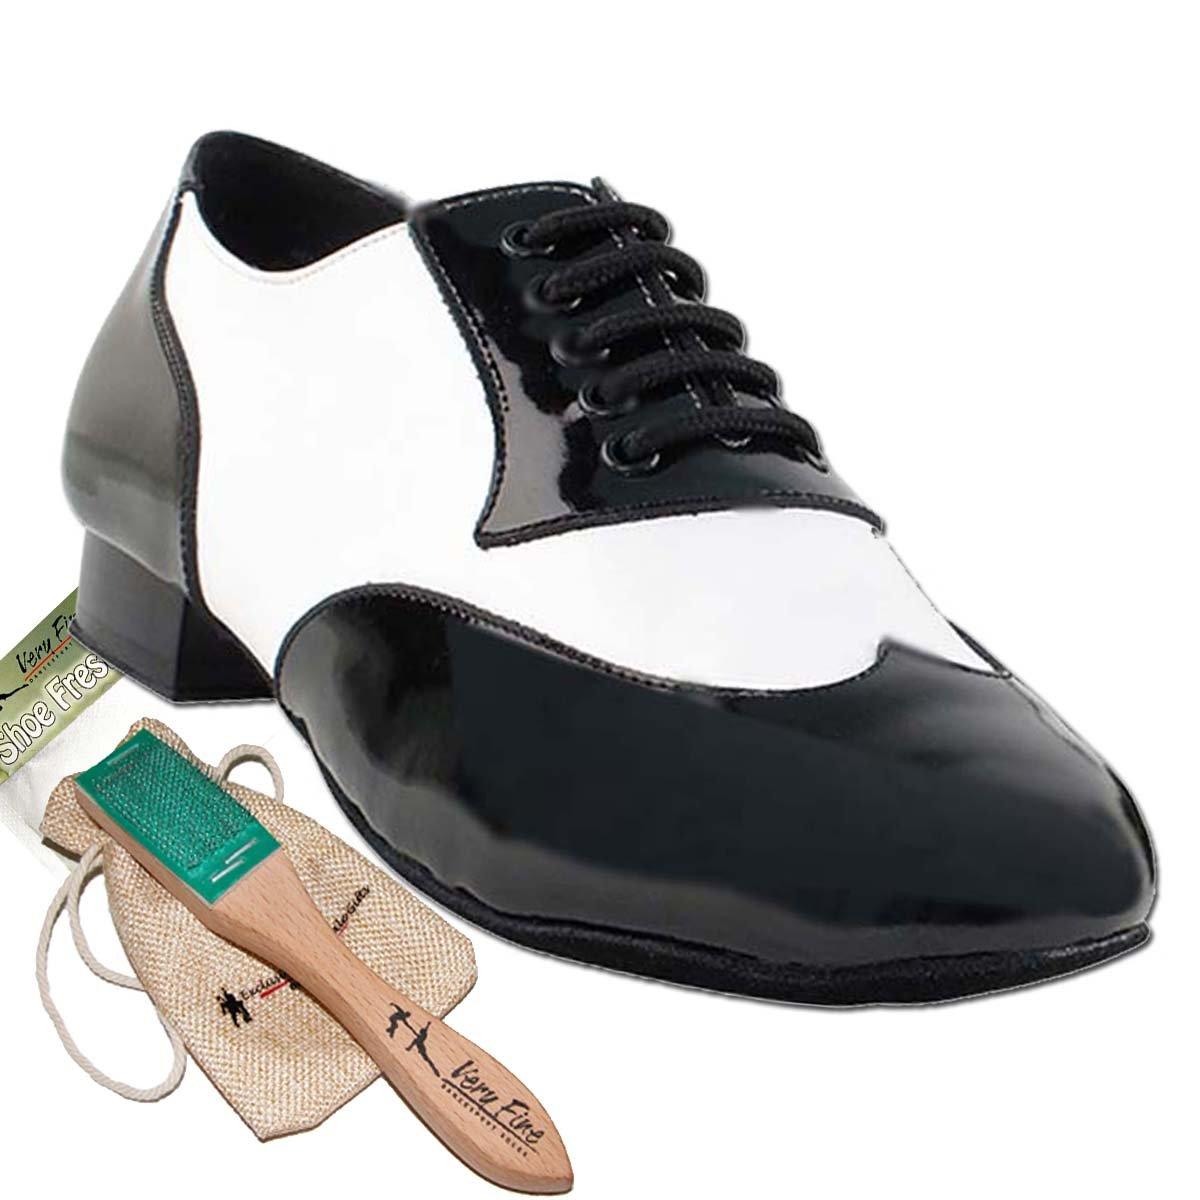 Men Ballroom Dance Shoes Standard & Smooth Tango Wedding Salsa Shoe CM100101EB-Very Fine 1